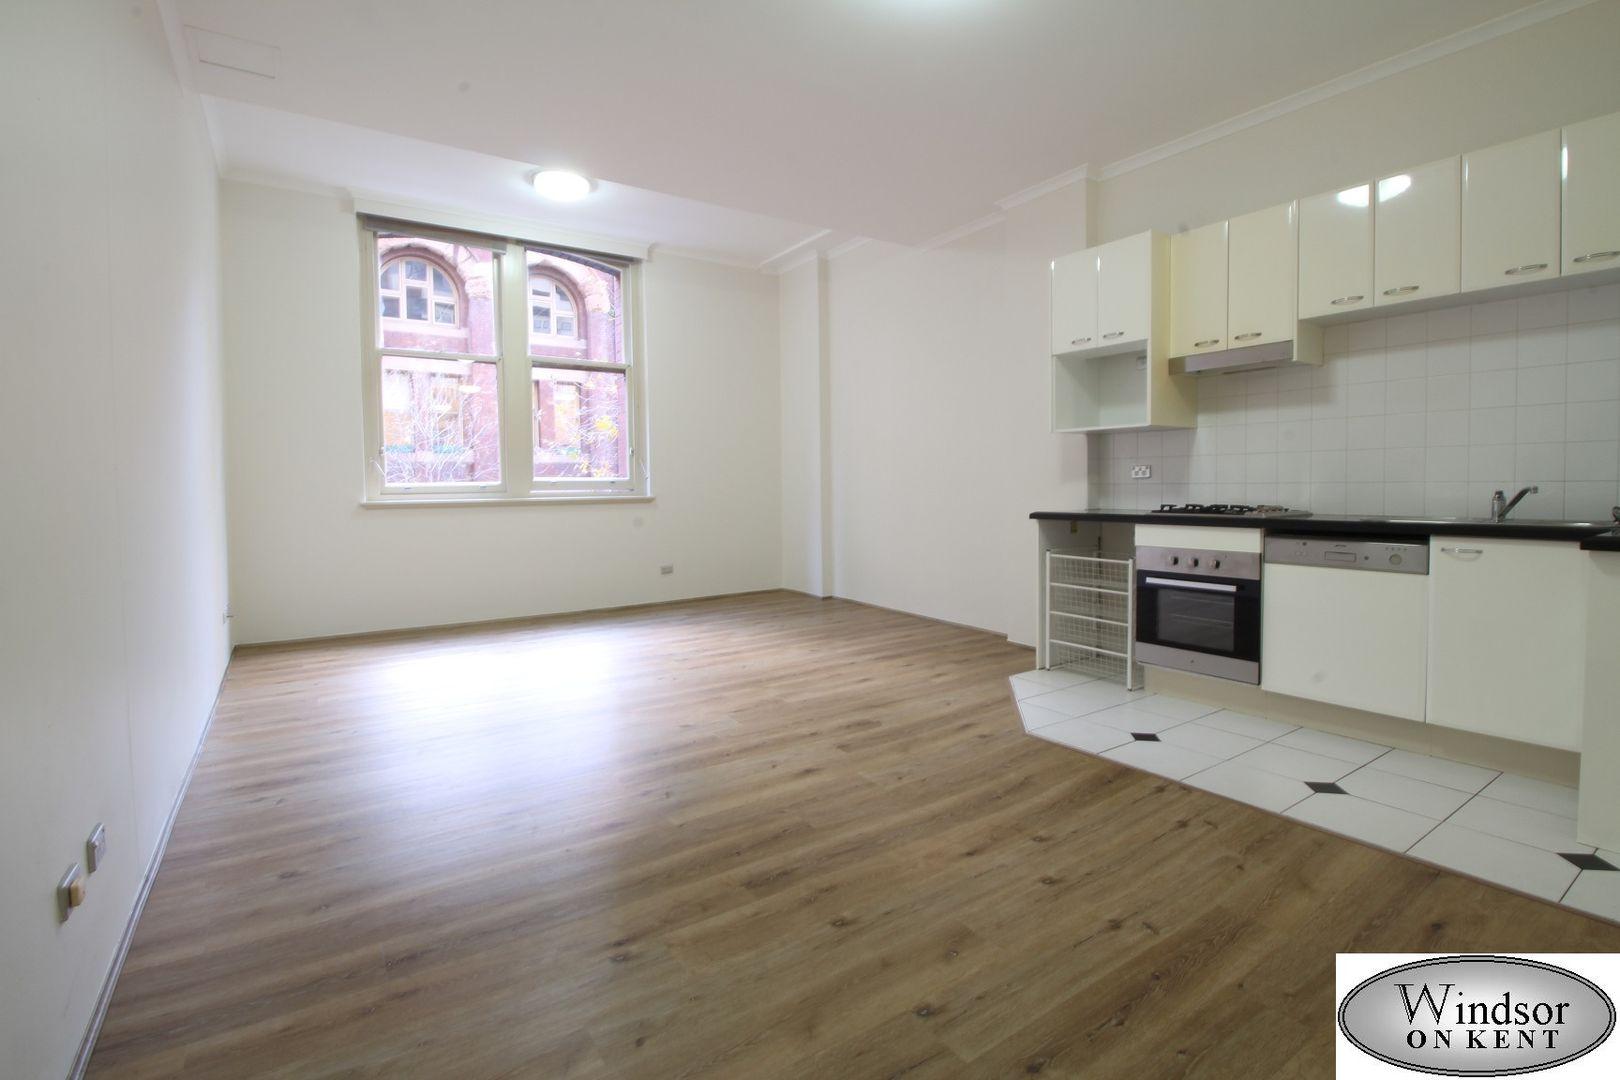 1 bedrooms Apartment / Unit / Flat in 365 KENT STREET SYDNEY NSW, 2000